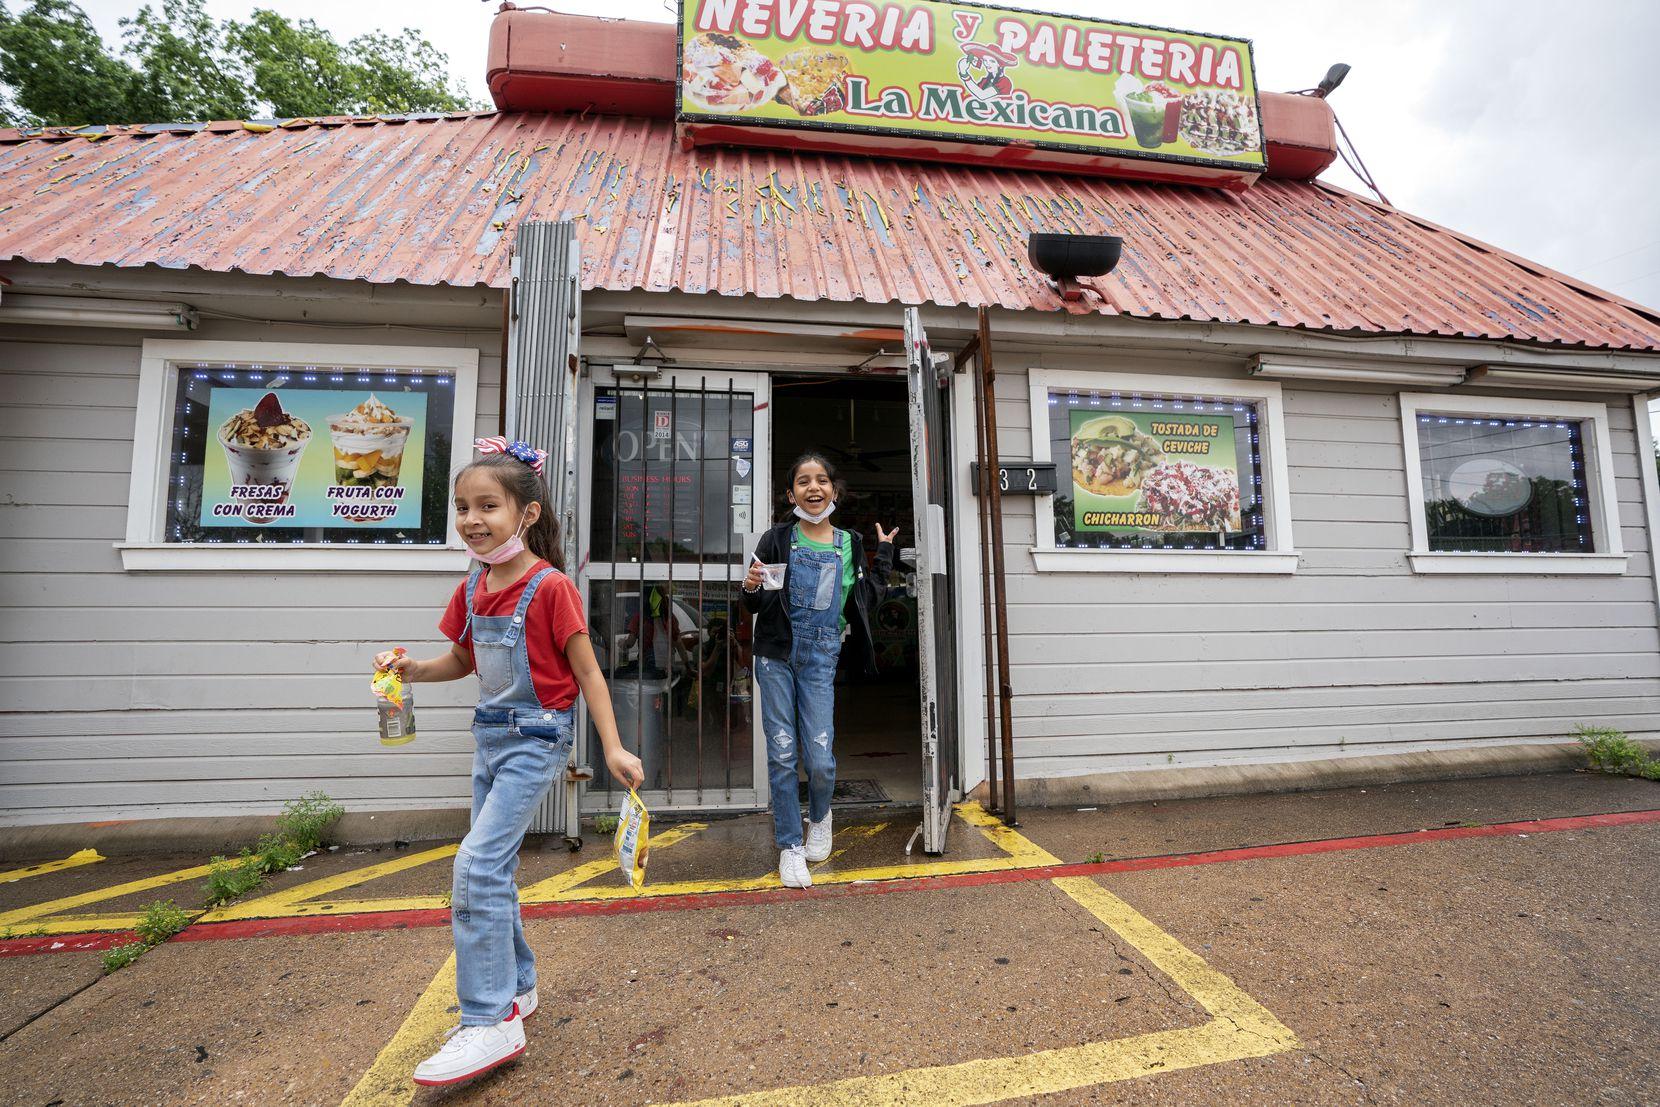 Isabella Melendez (left), 6, and her sister Sophia Melendez, 9, leave La Mexicana Neveria y Paleteria across from Winnetka Elementary School on Thursday.